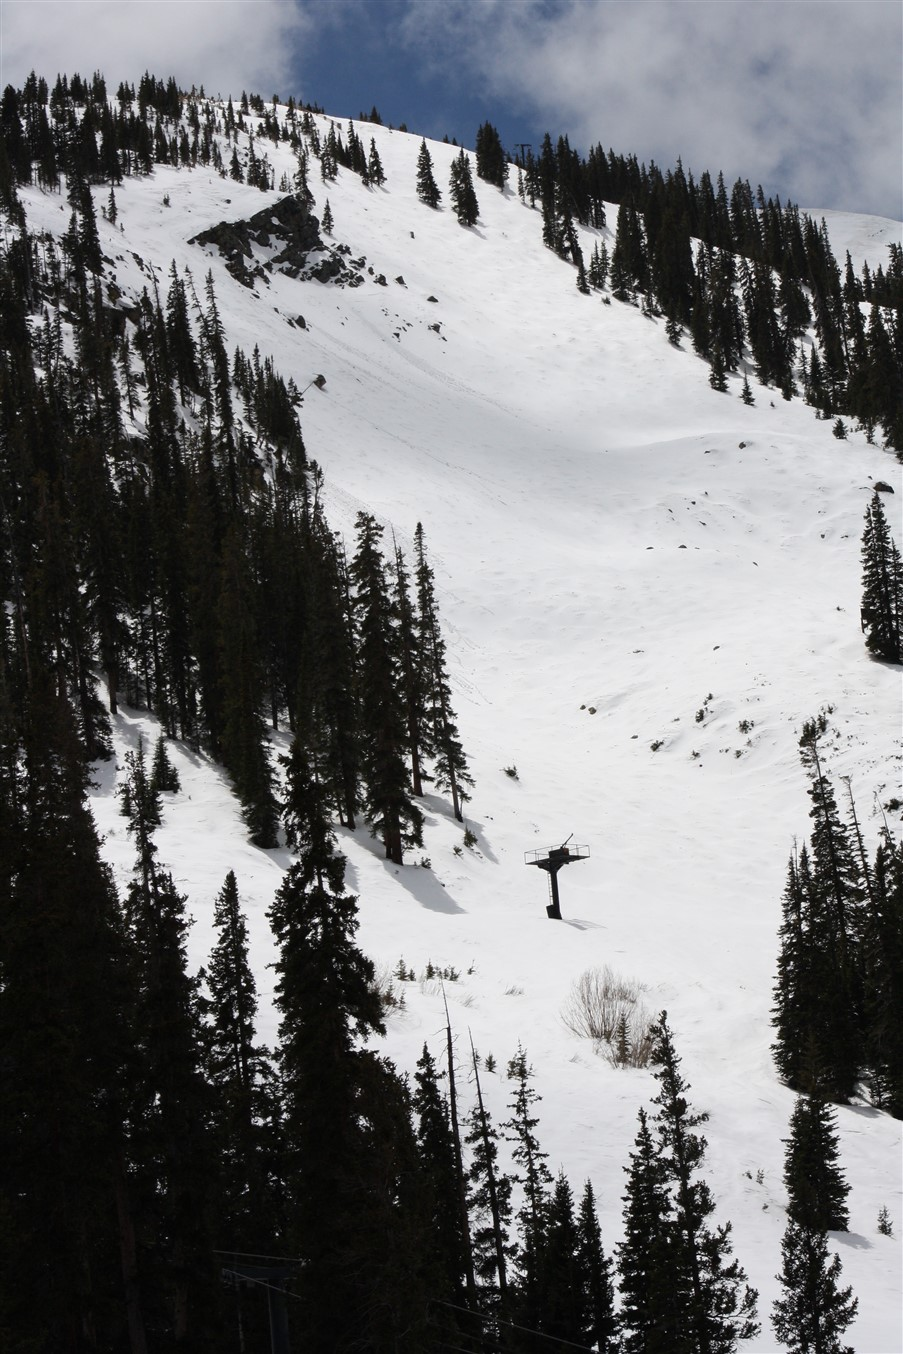 2010 05 20 Colorado 44 Arapahoe Basin Skiing.jpg